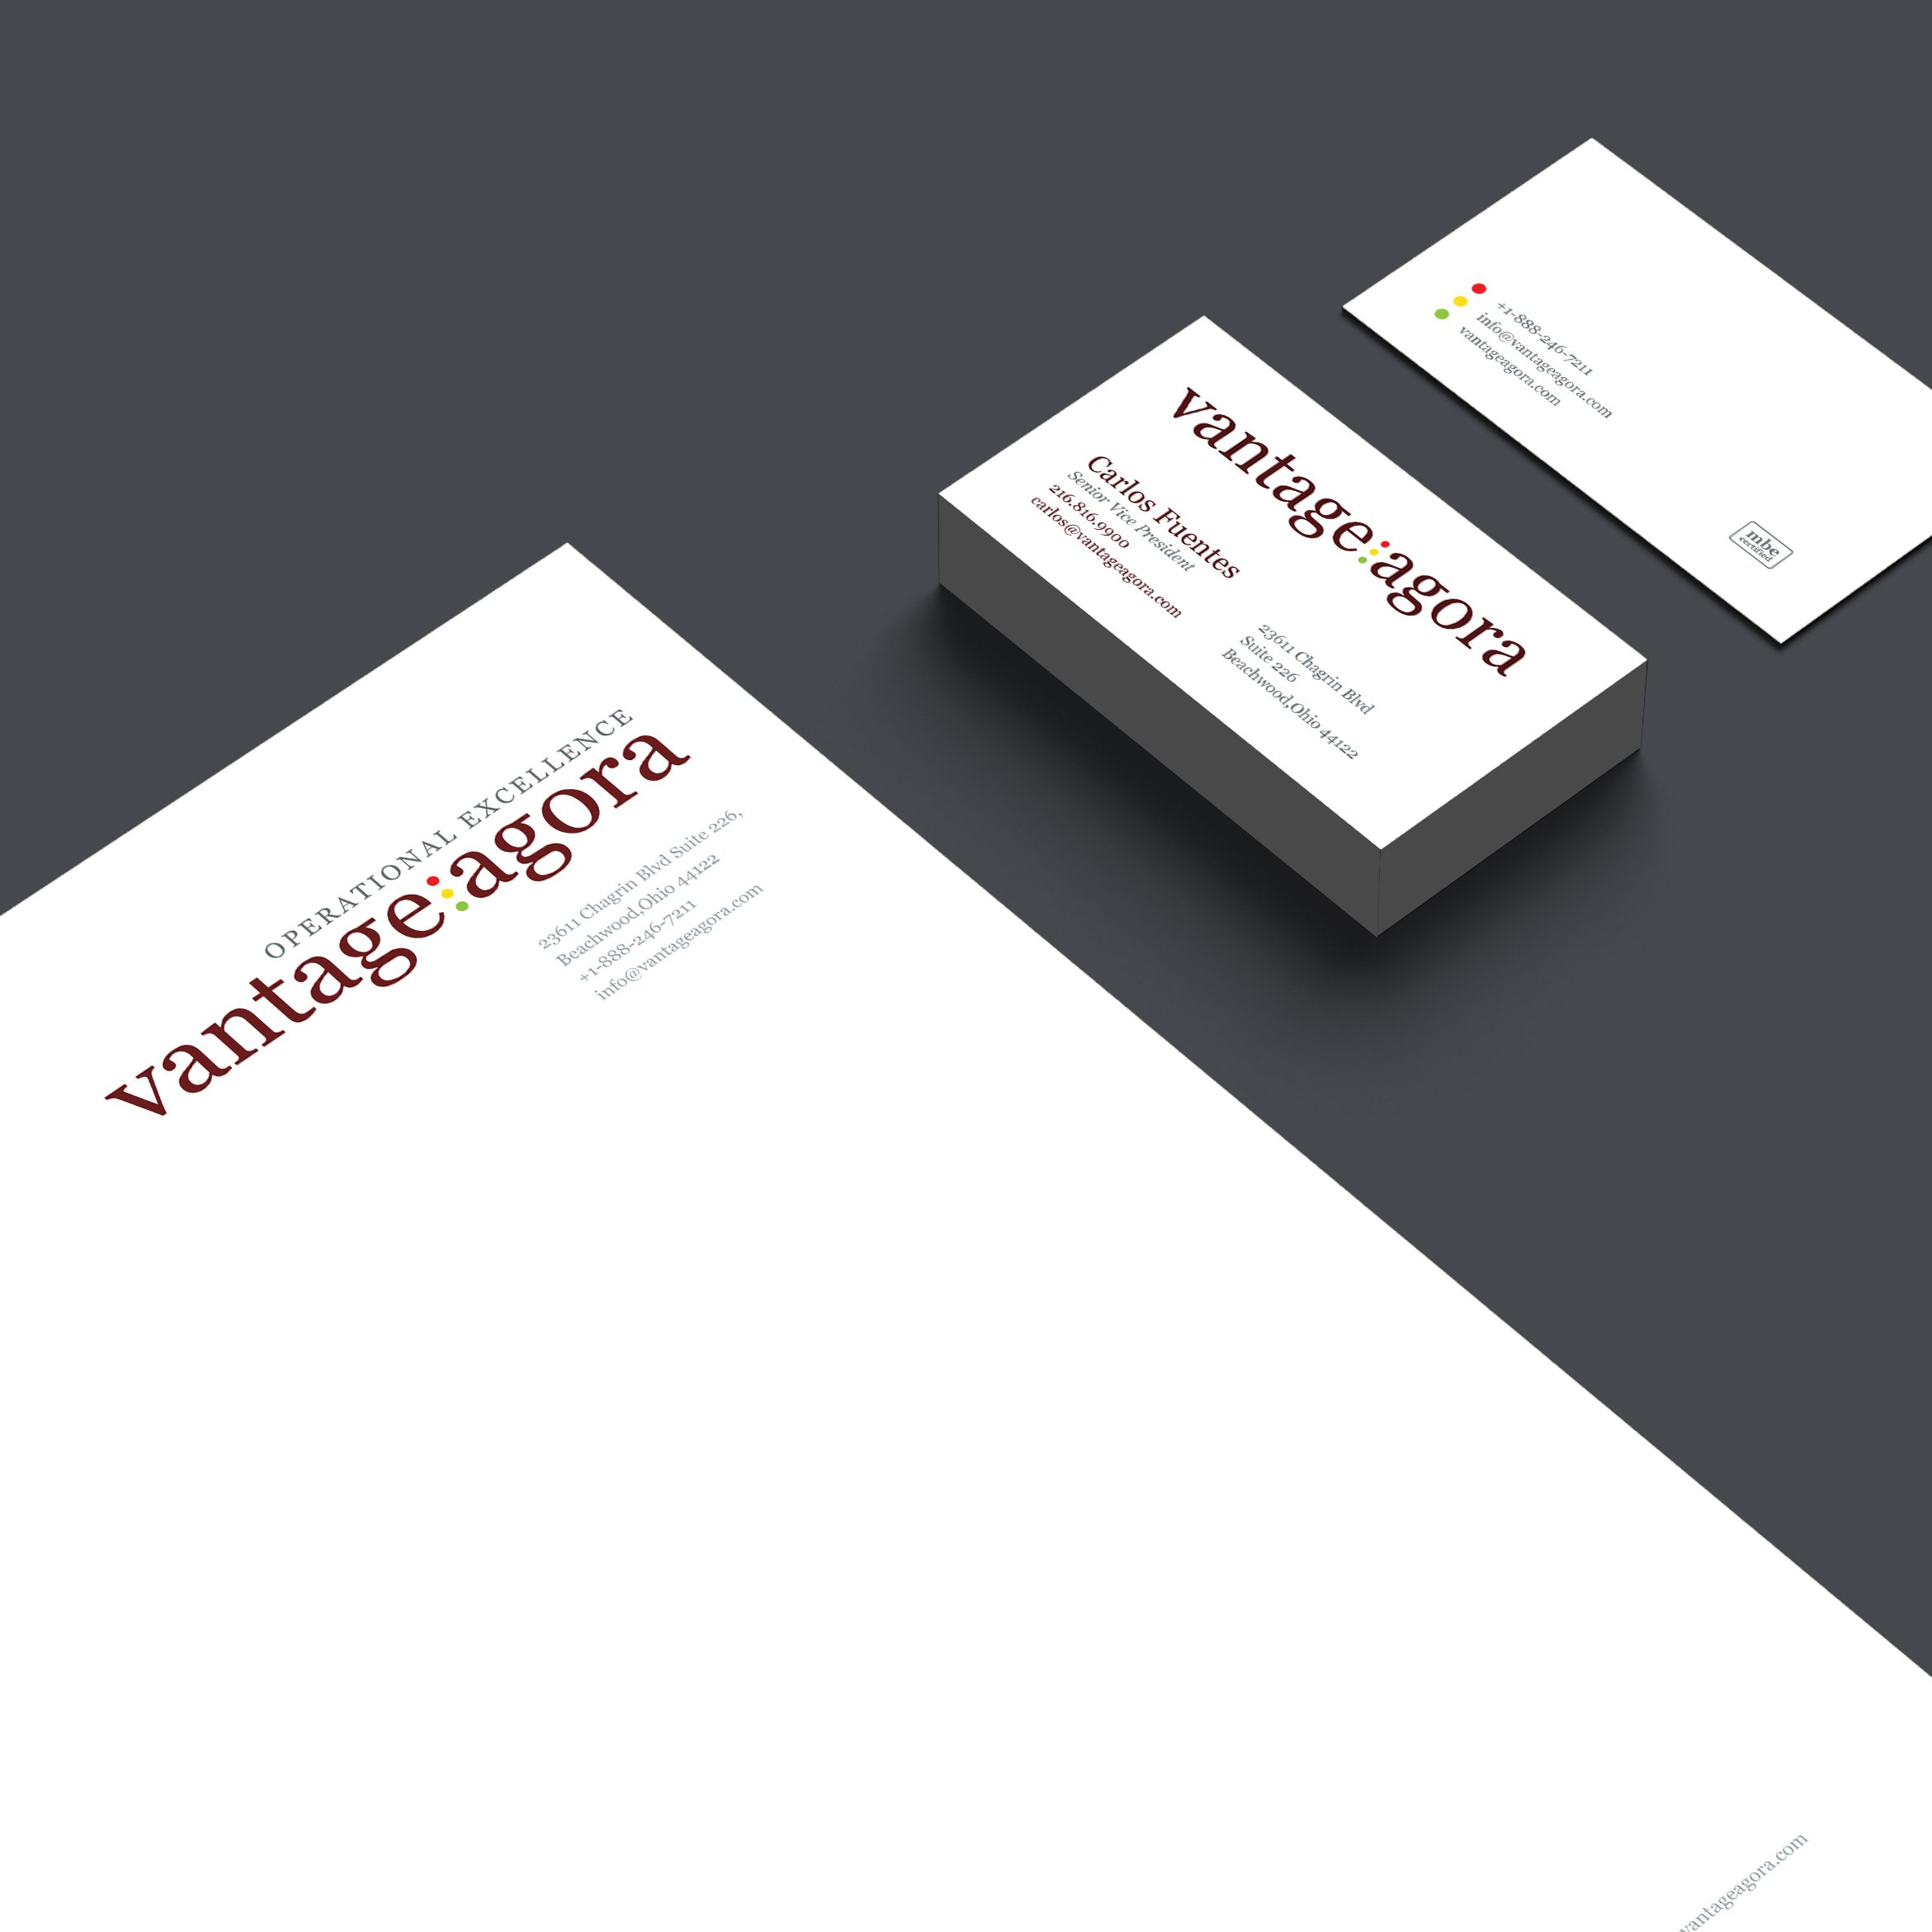 Vantage Agora Identity Design